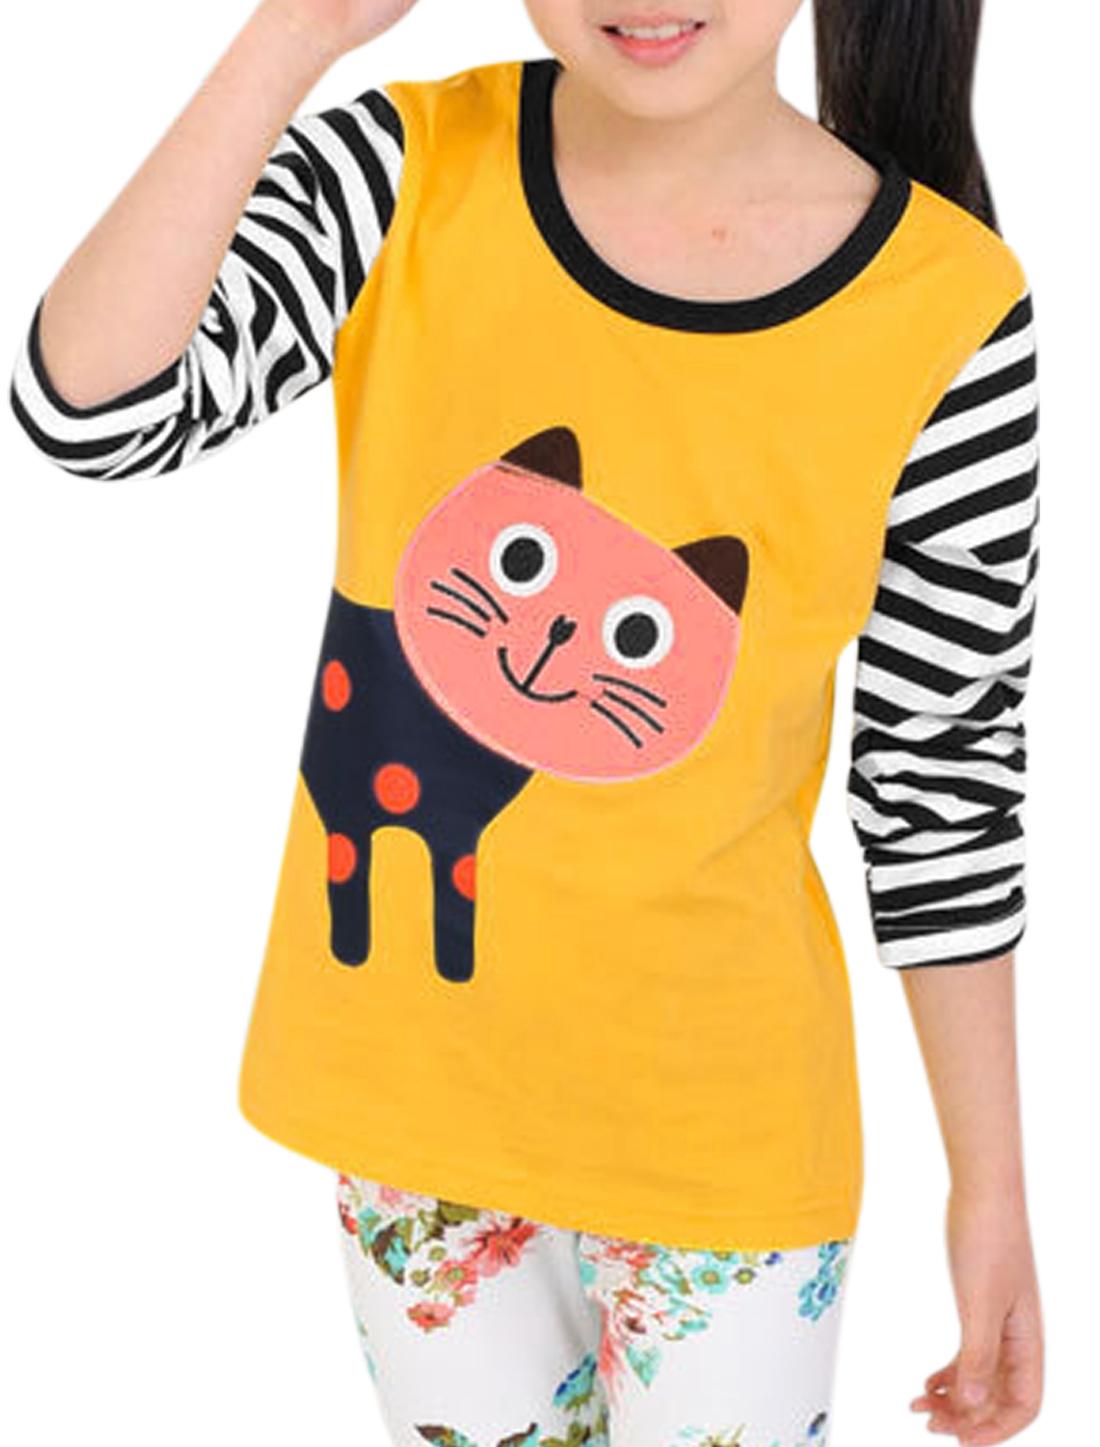 Girls Stripes Cartoon Cat Applique Long Sleeves Top Yellow 12